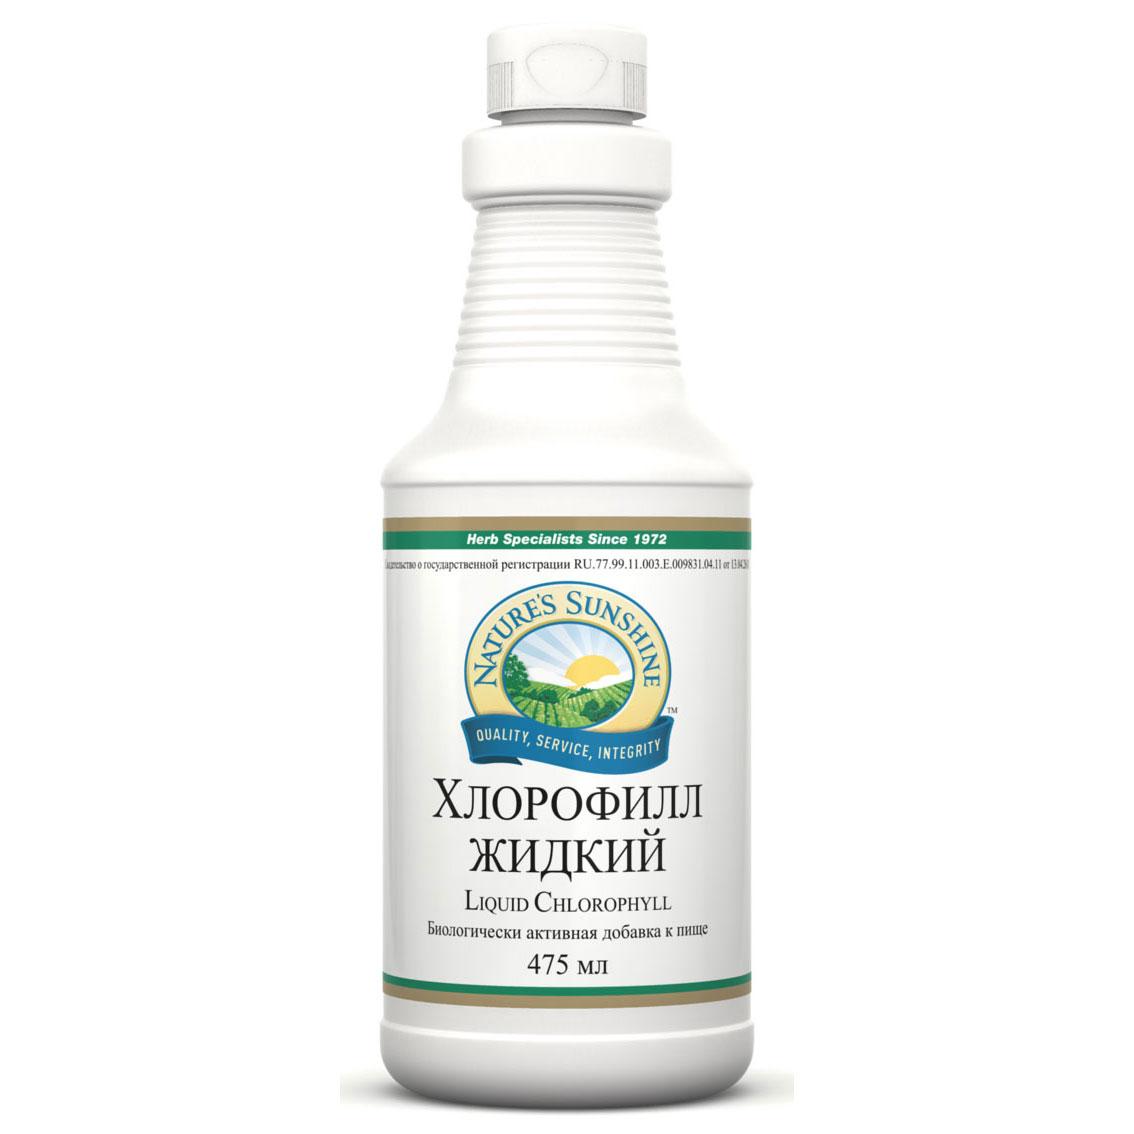 Хлорофилл Жидкий НСП Chlorophyll Liquid NSP